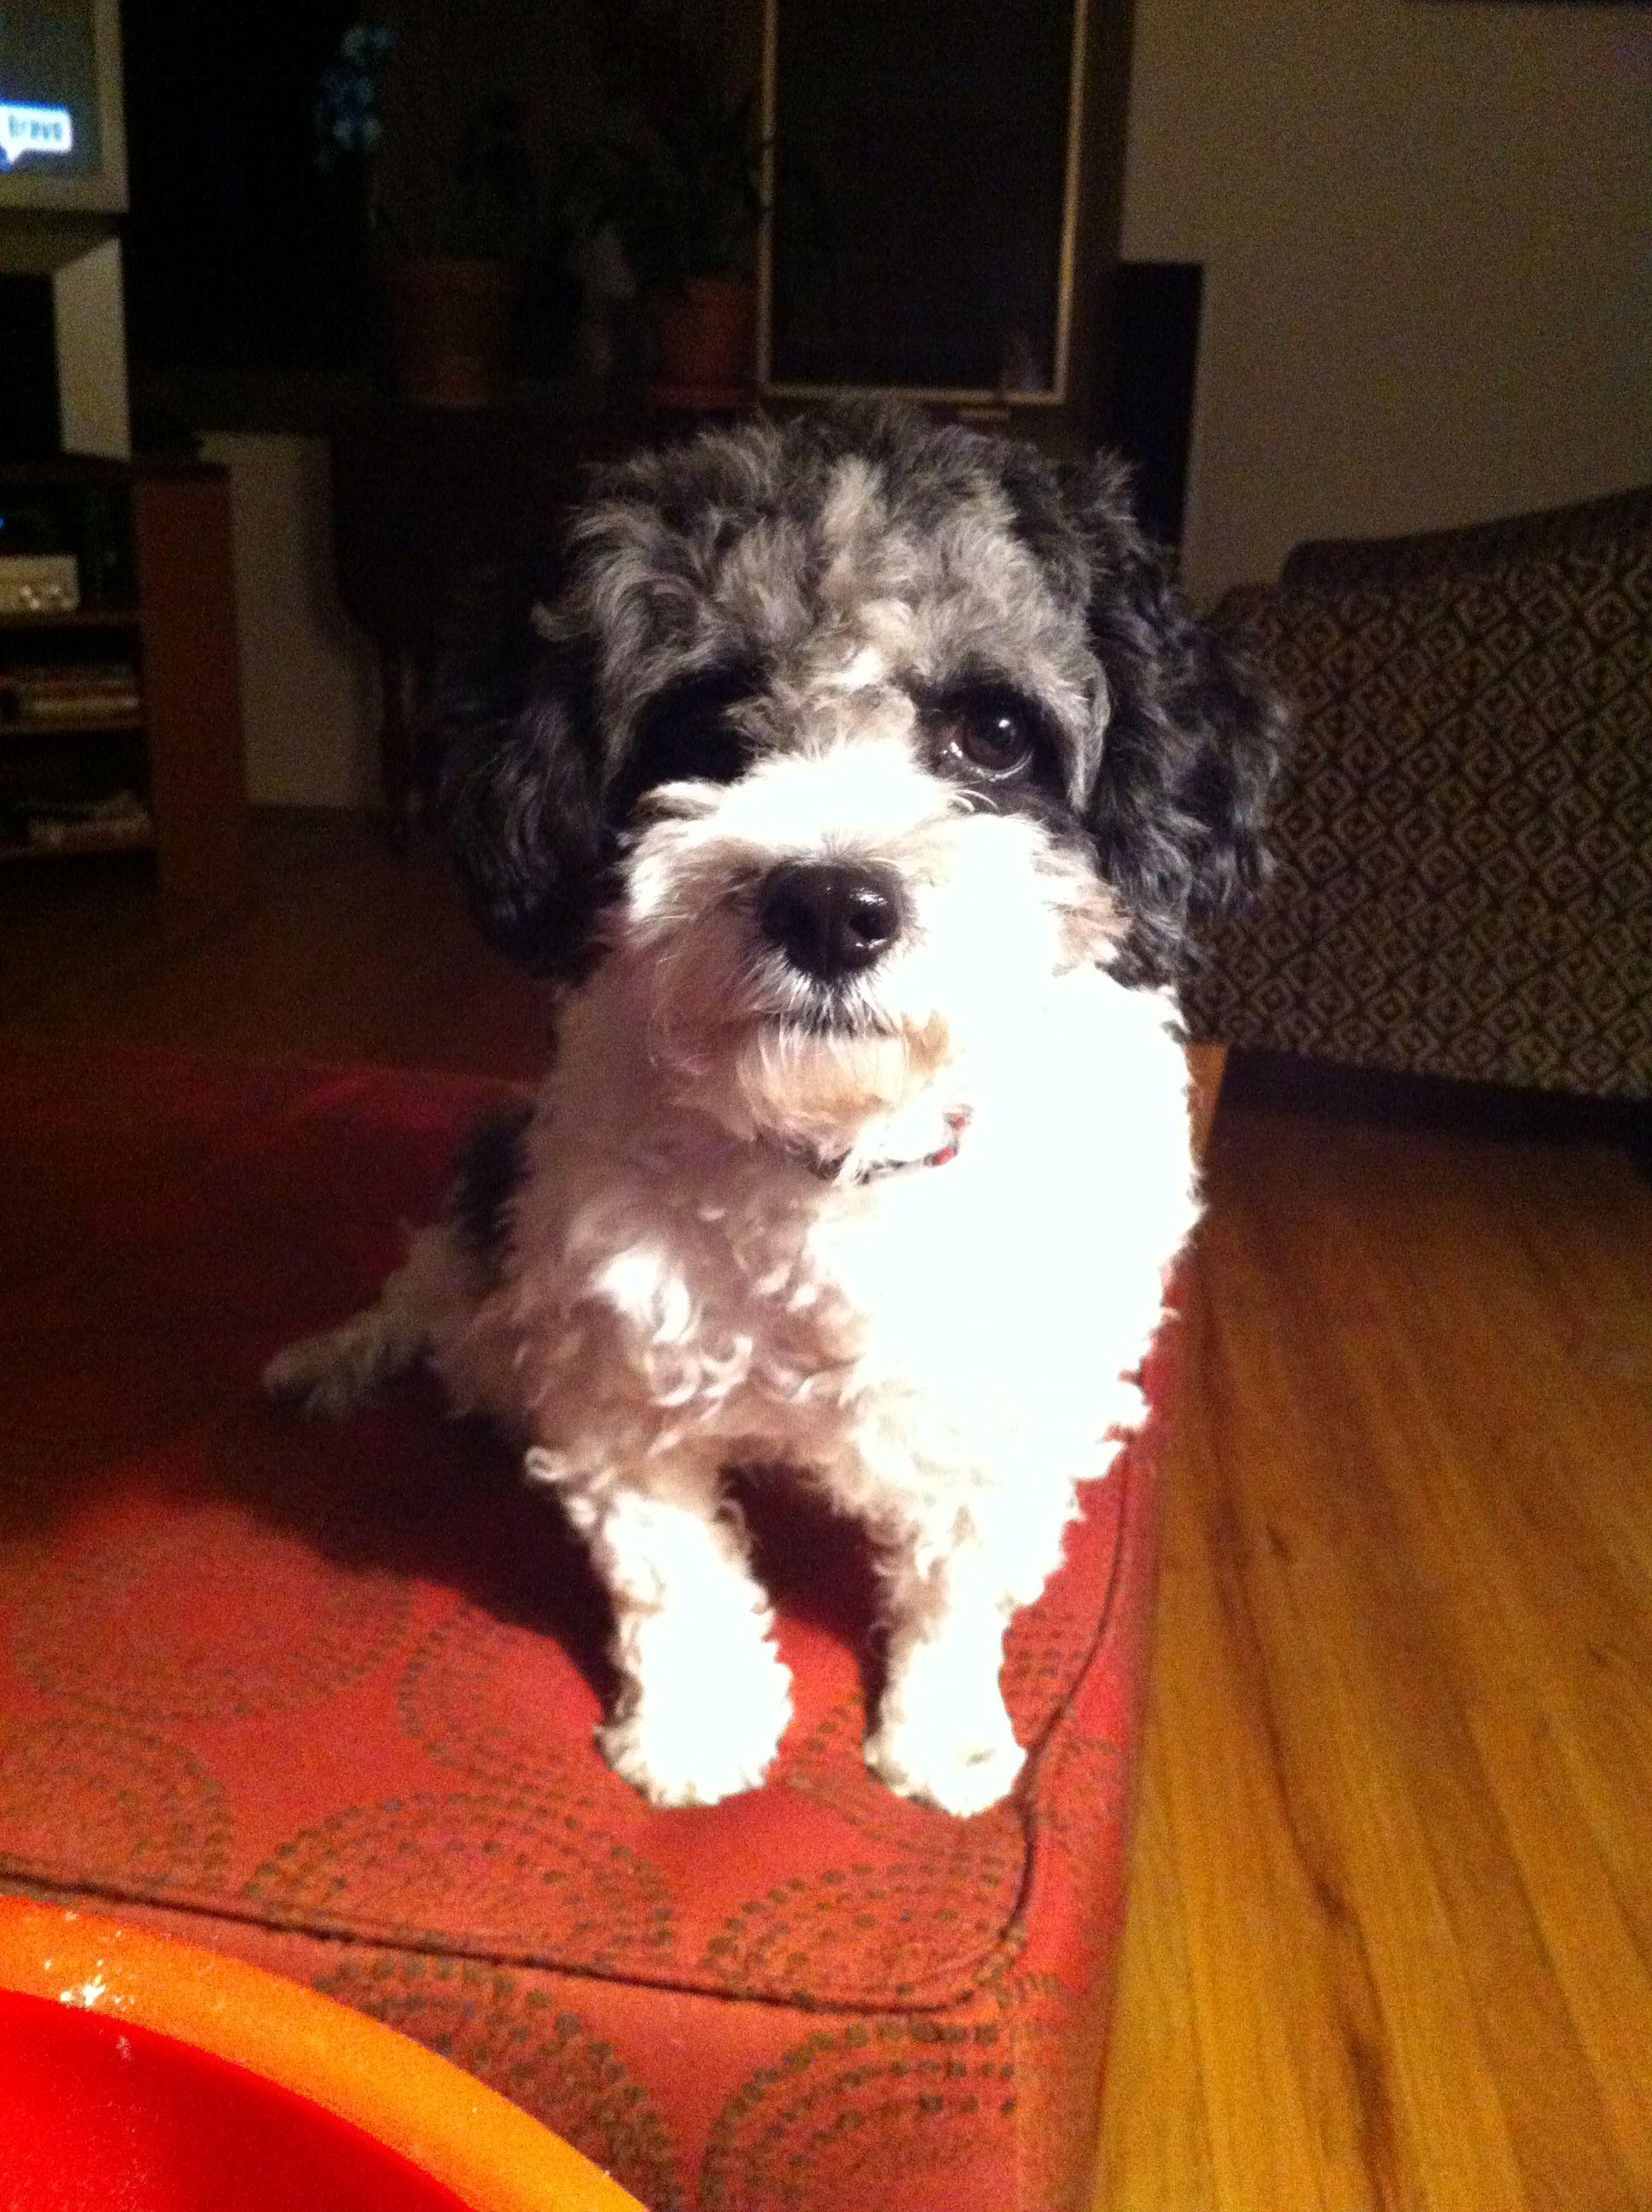 Lulu awaits popcorn